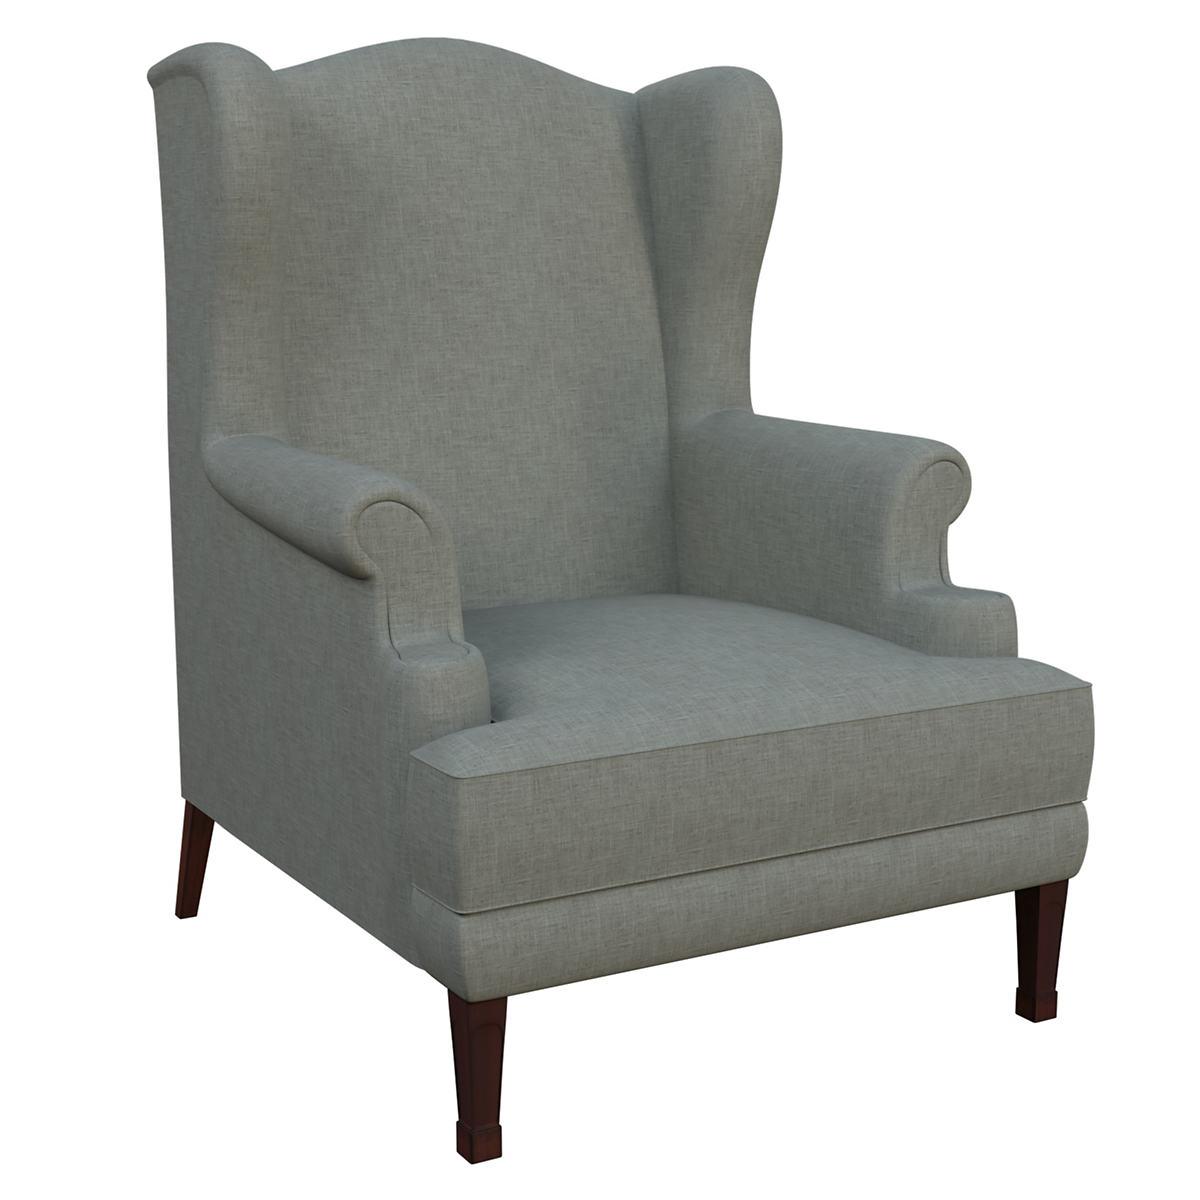 Canvasuede Ocean Lismore Chair